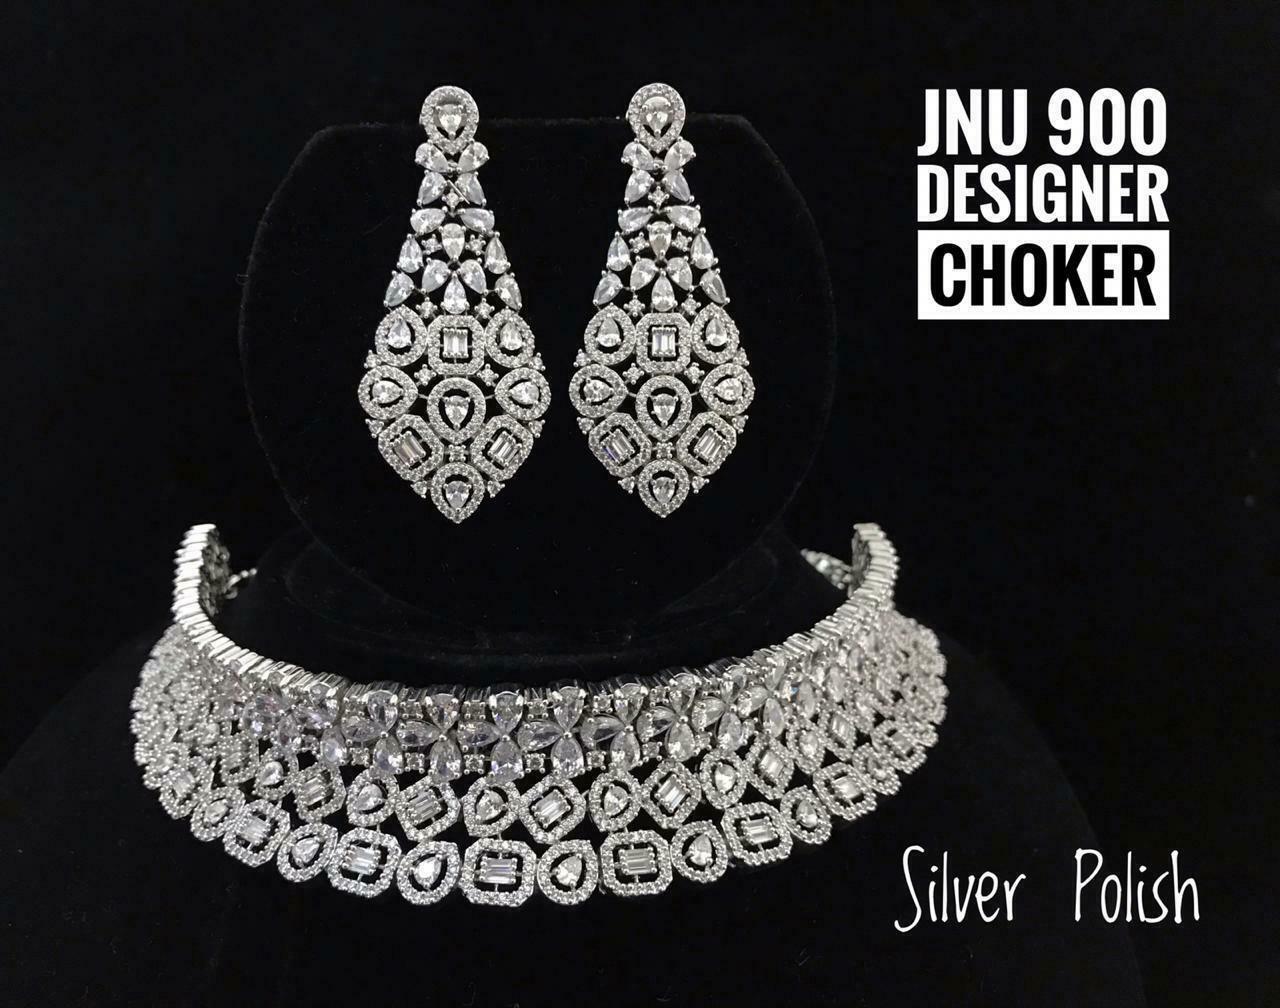 Cz High Quality Indian Bollywood Fashion Partywear Choker Necklace Set U210